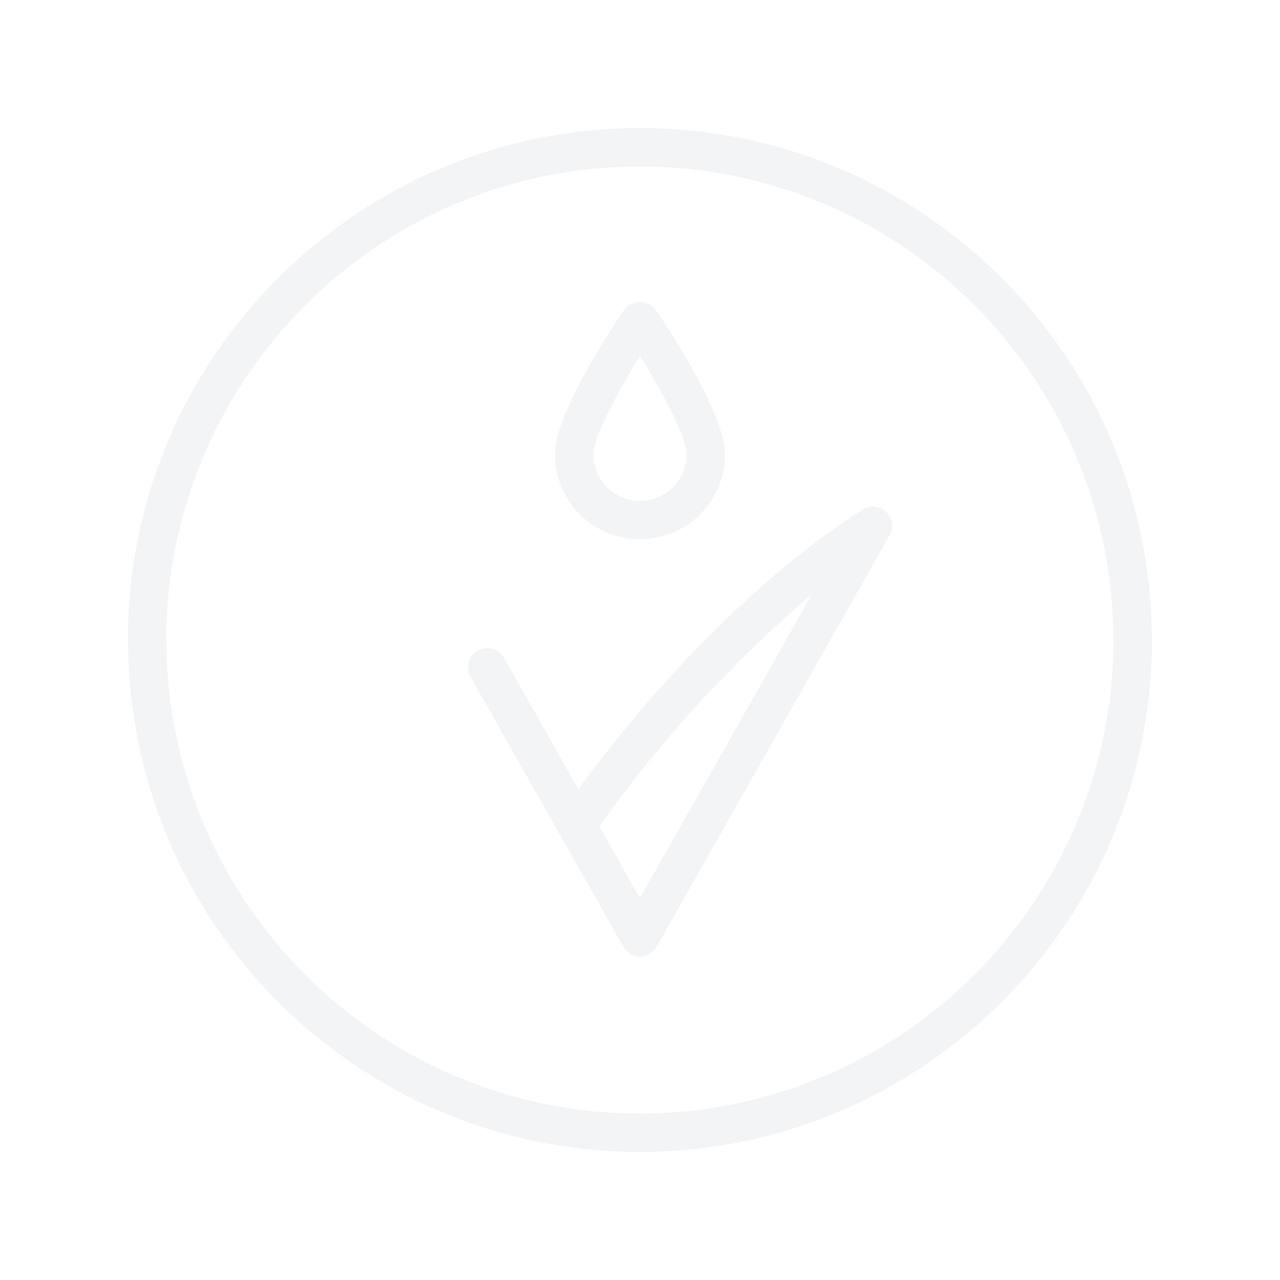 MITOMO Konjac Sponge With Bamboo Charcoal